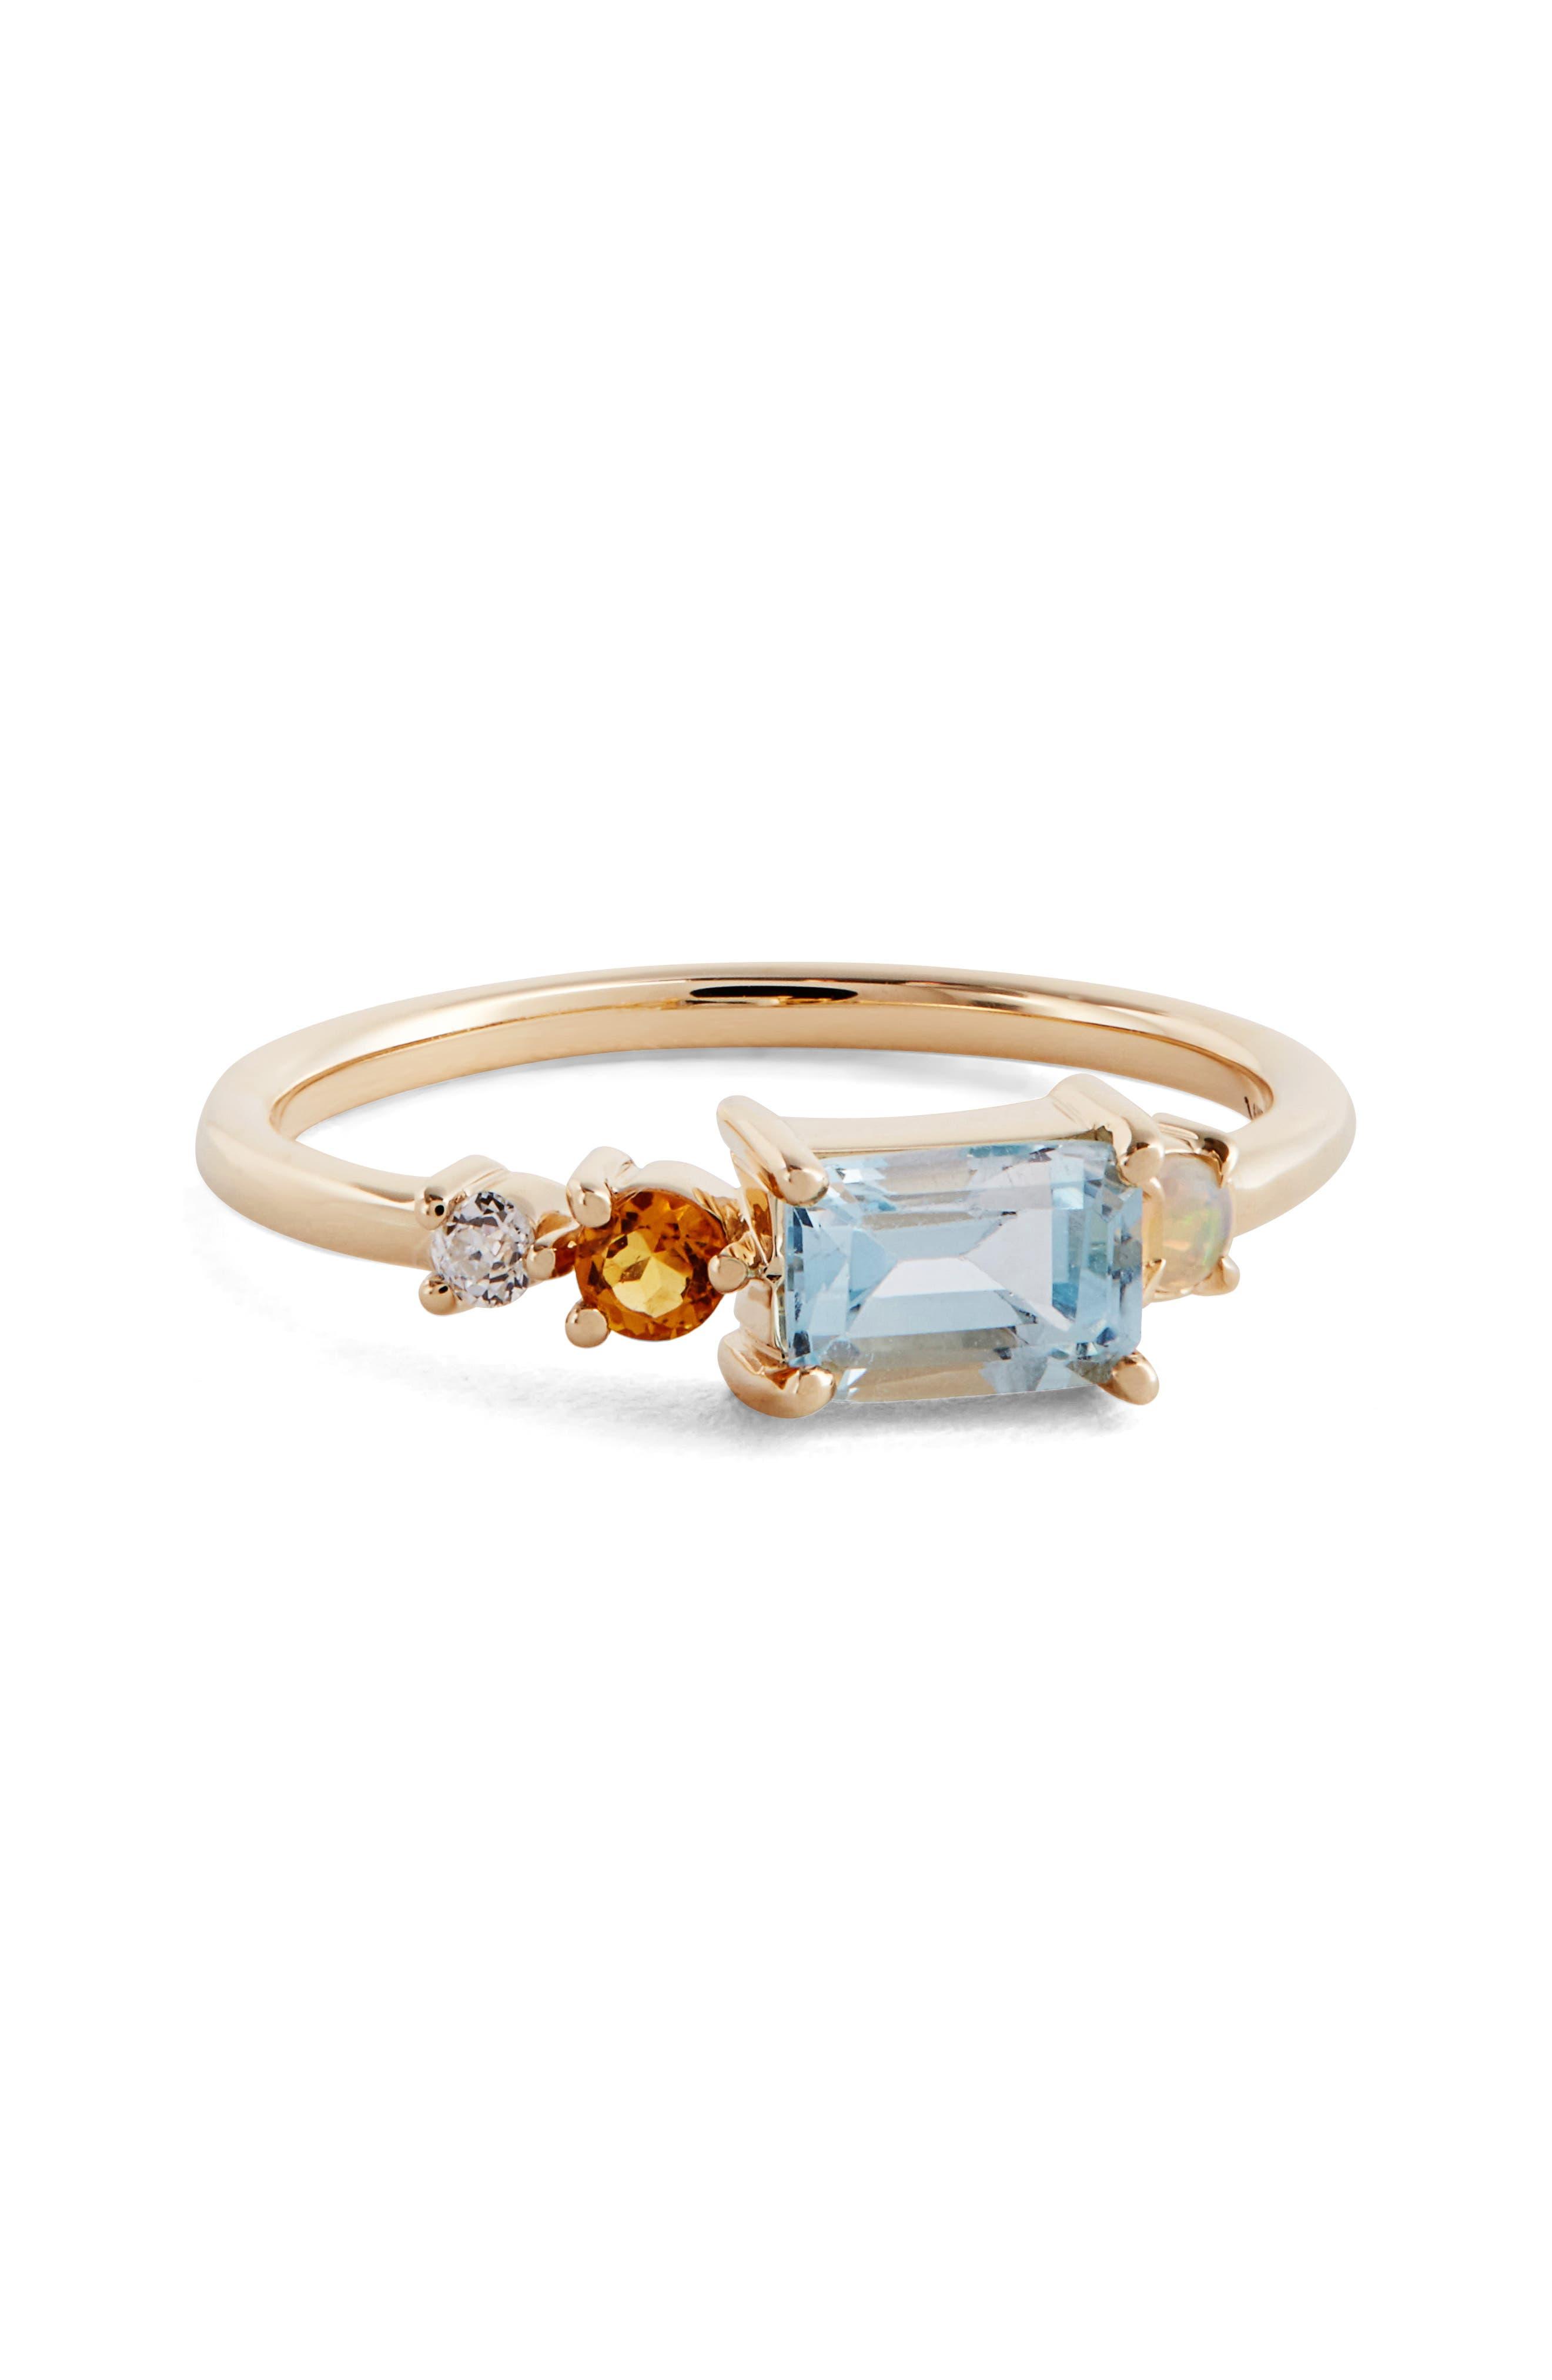 MOCIUN Topaz, Opal, Citrine & Diamond Ring